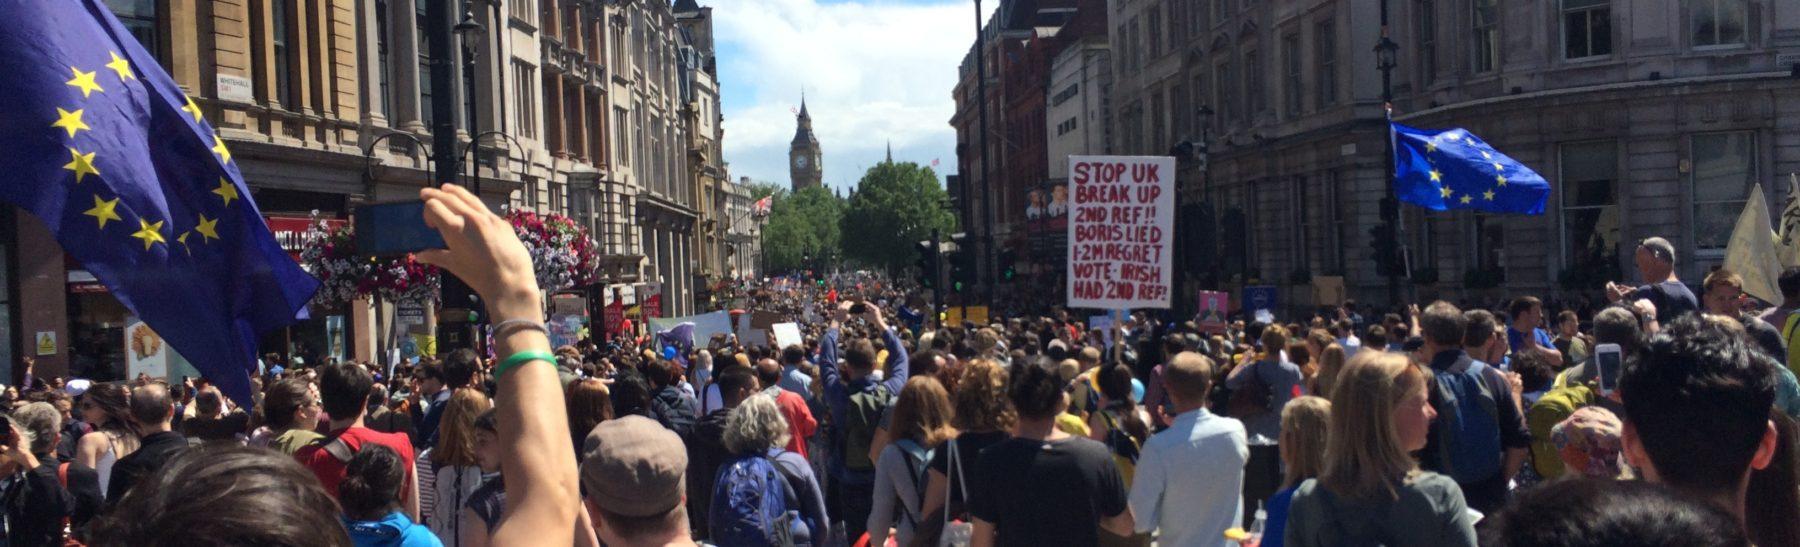 EU referendum Brexit protest